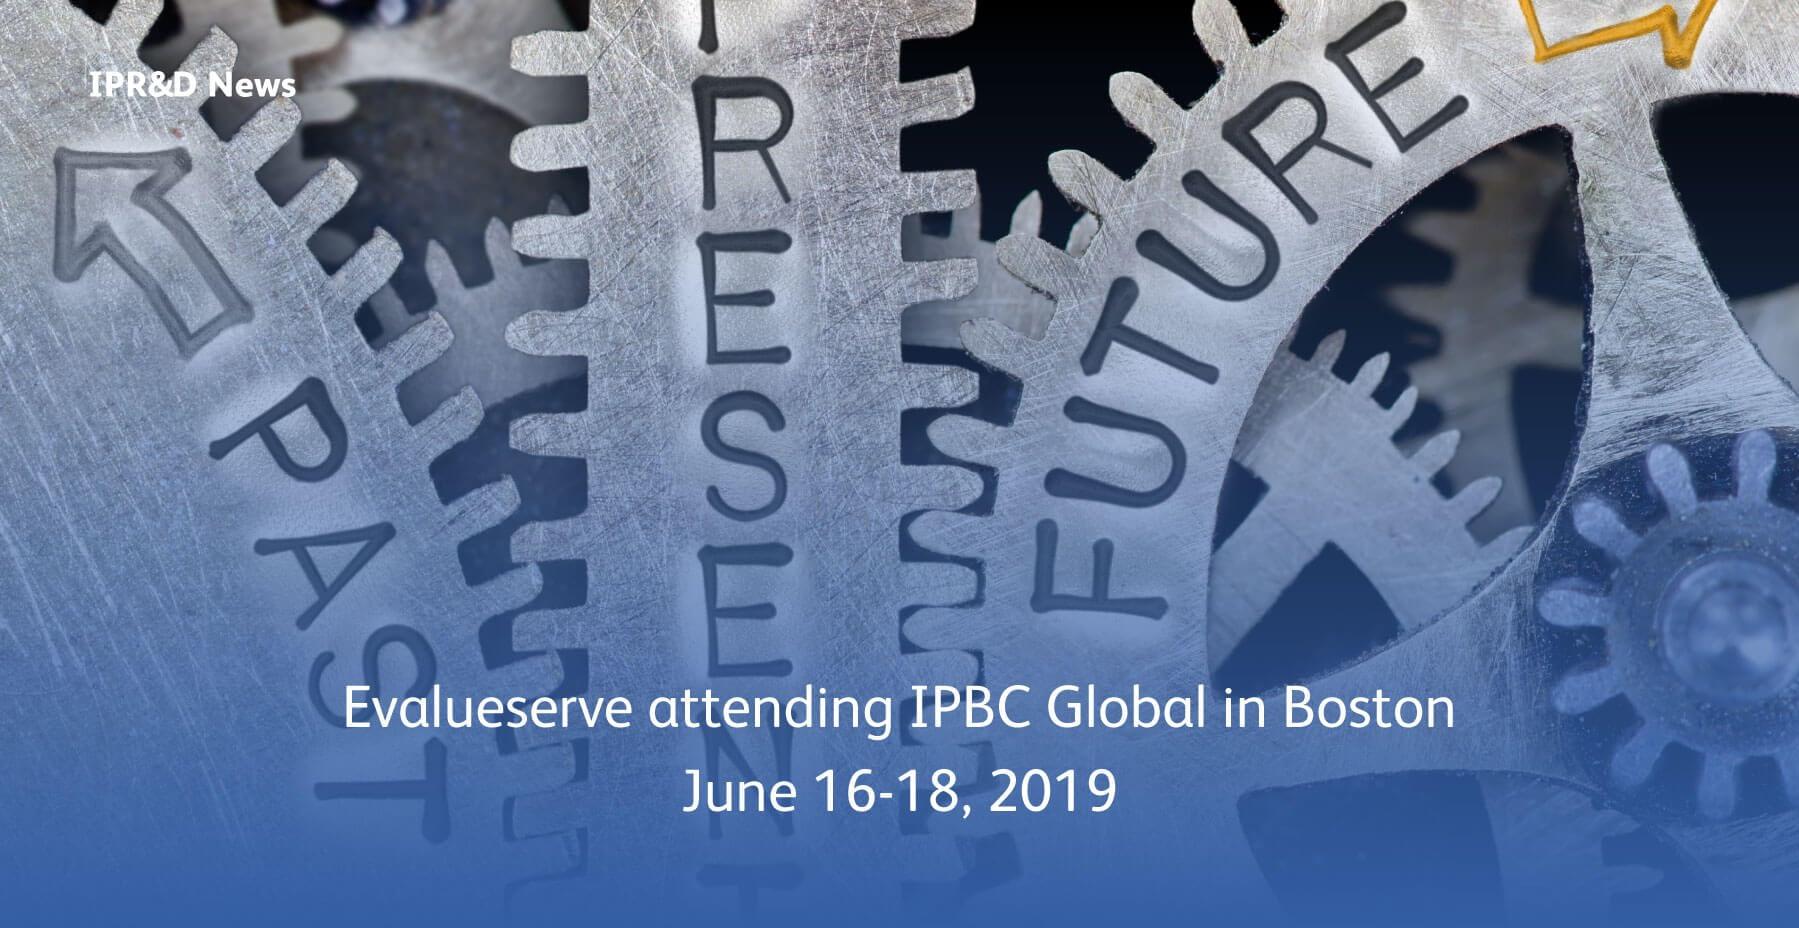 Evalueserve attending IPBC Global in Boston: June 16-18, 2019